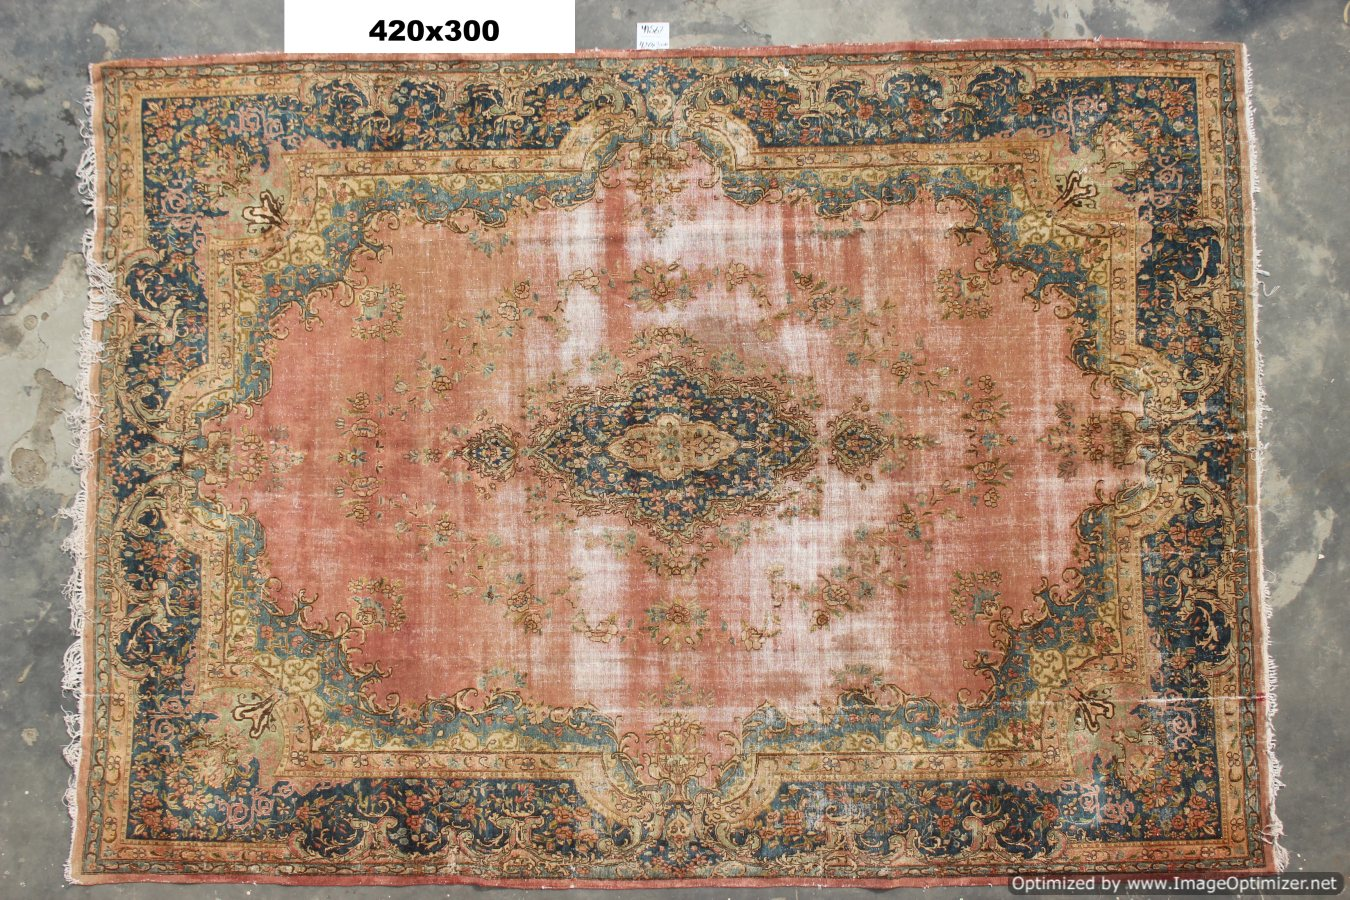 Vintage recoloured perzisch tapijt 41567 (420cm x 300cm)